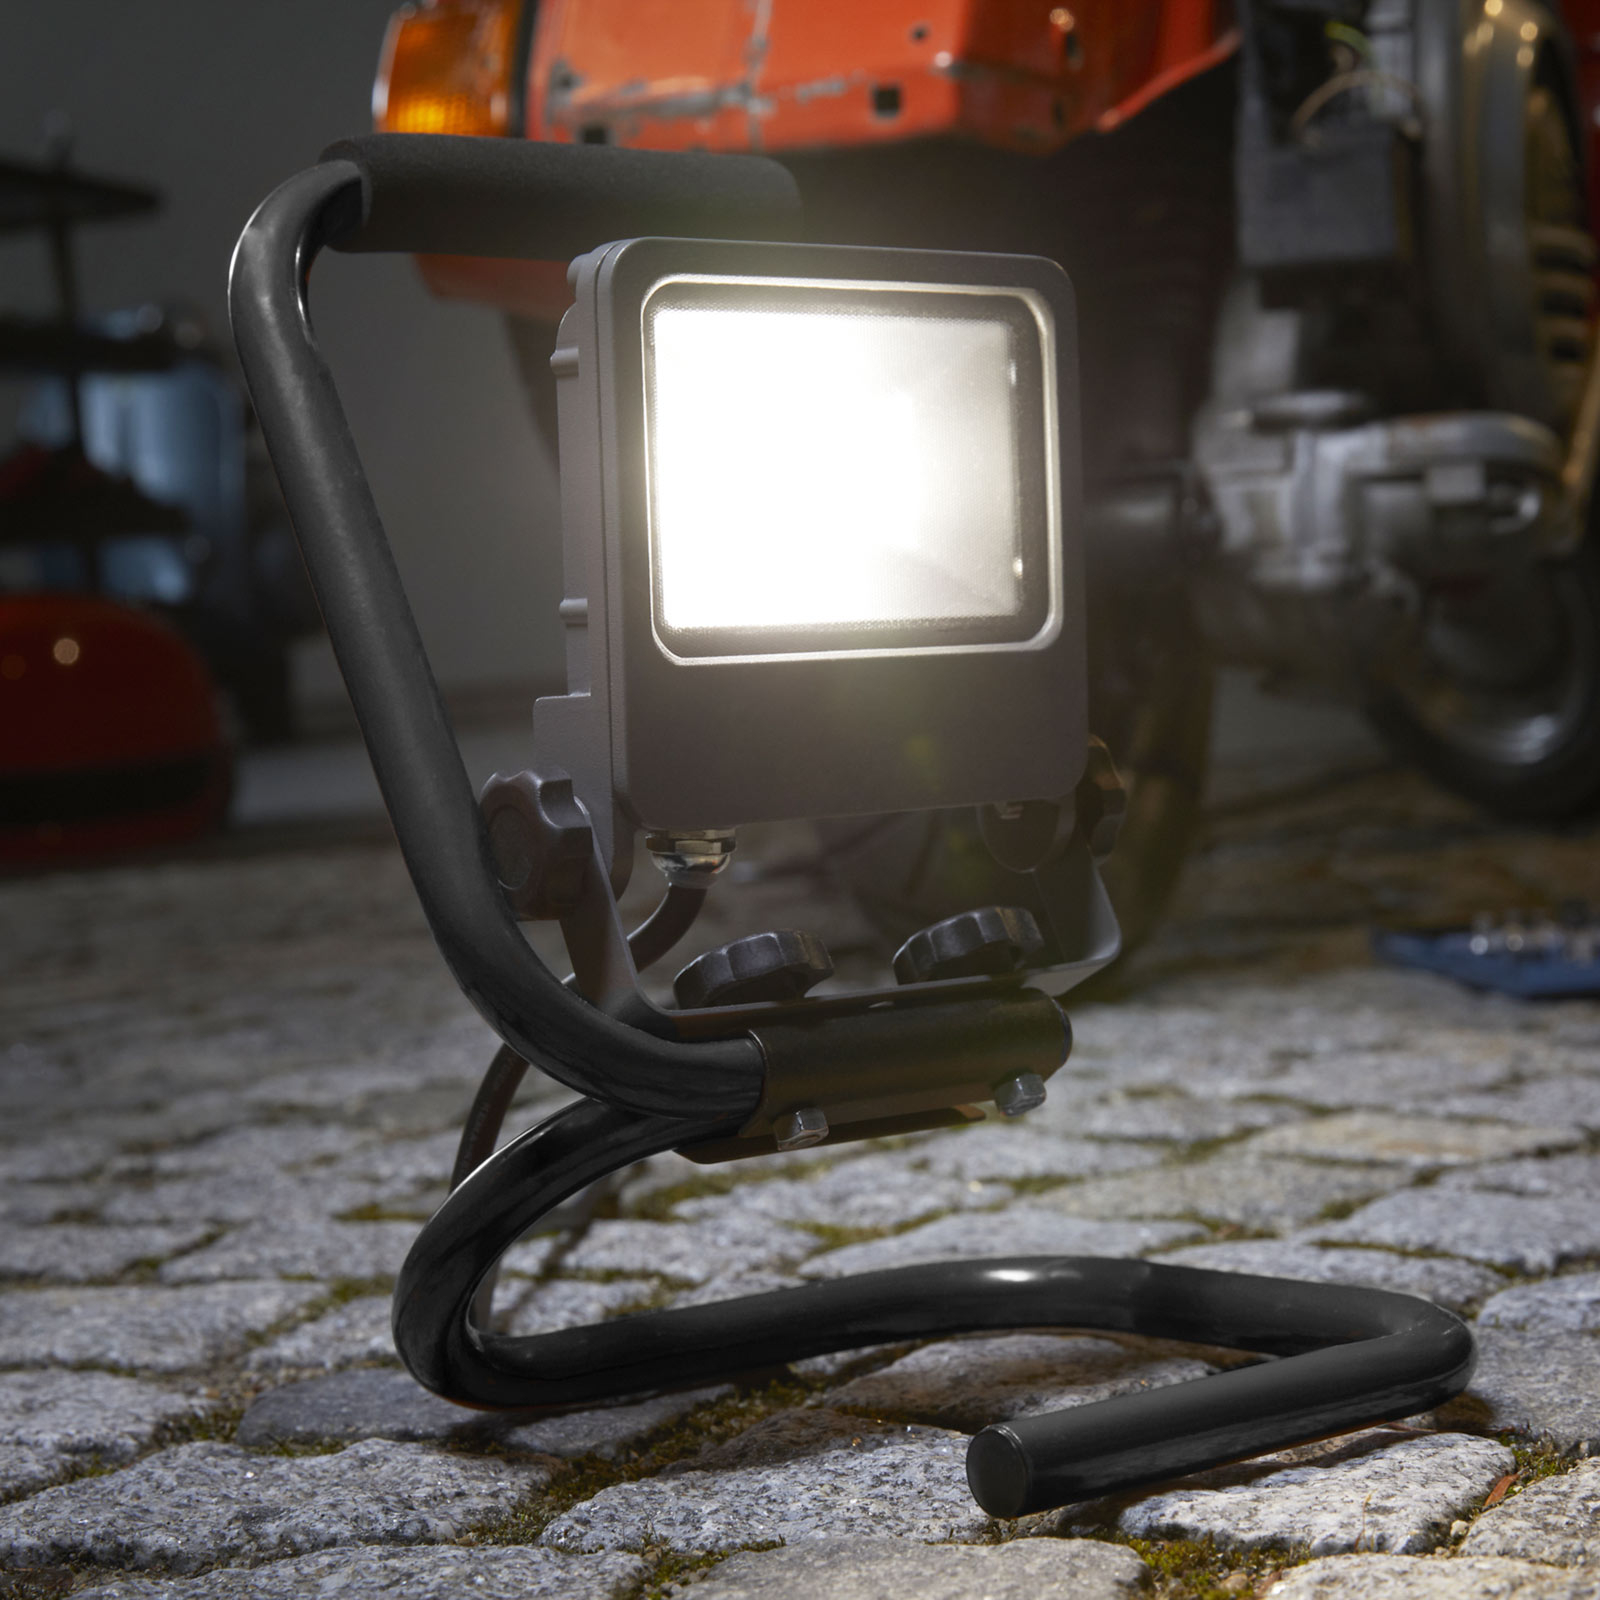 Acquista LEDVANCE Worklight S-Stand lampada LED portatile